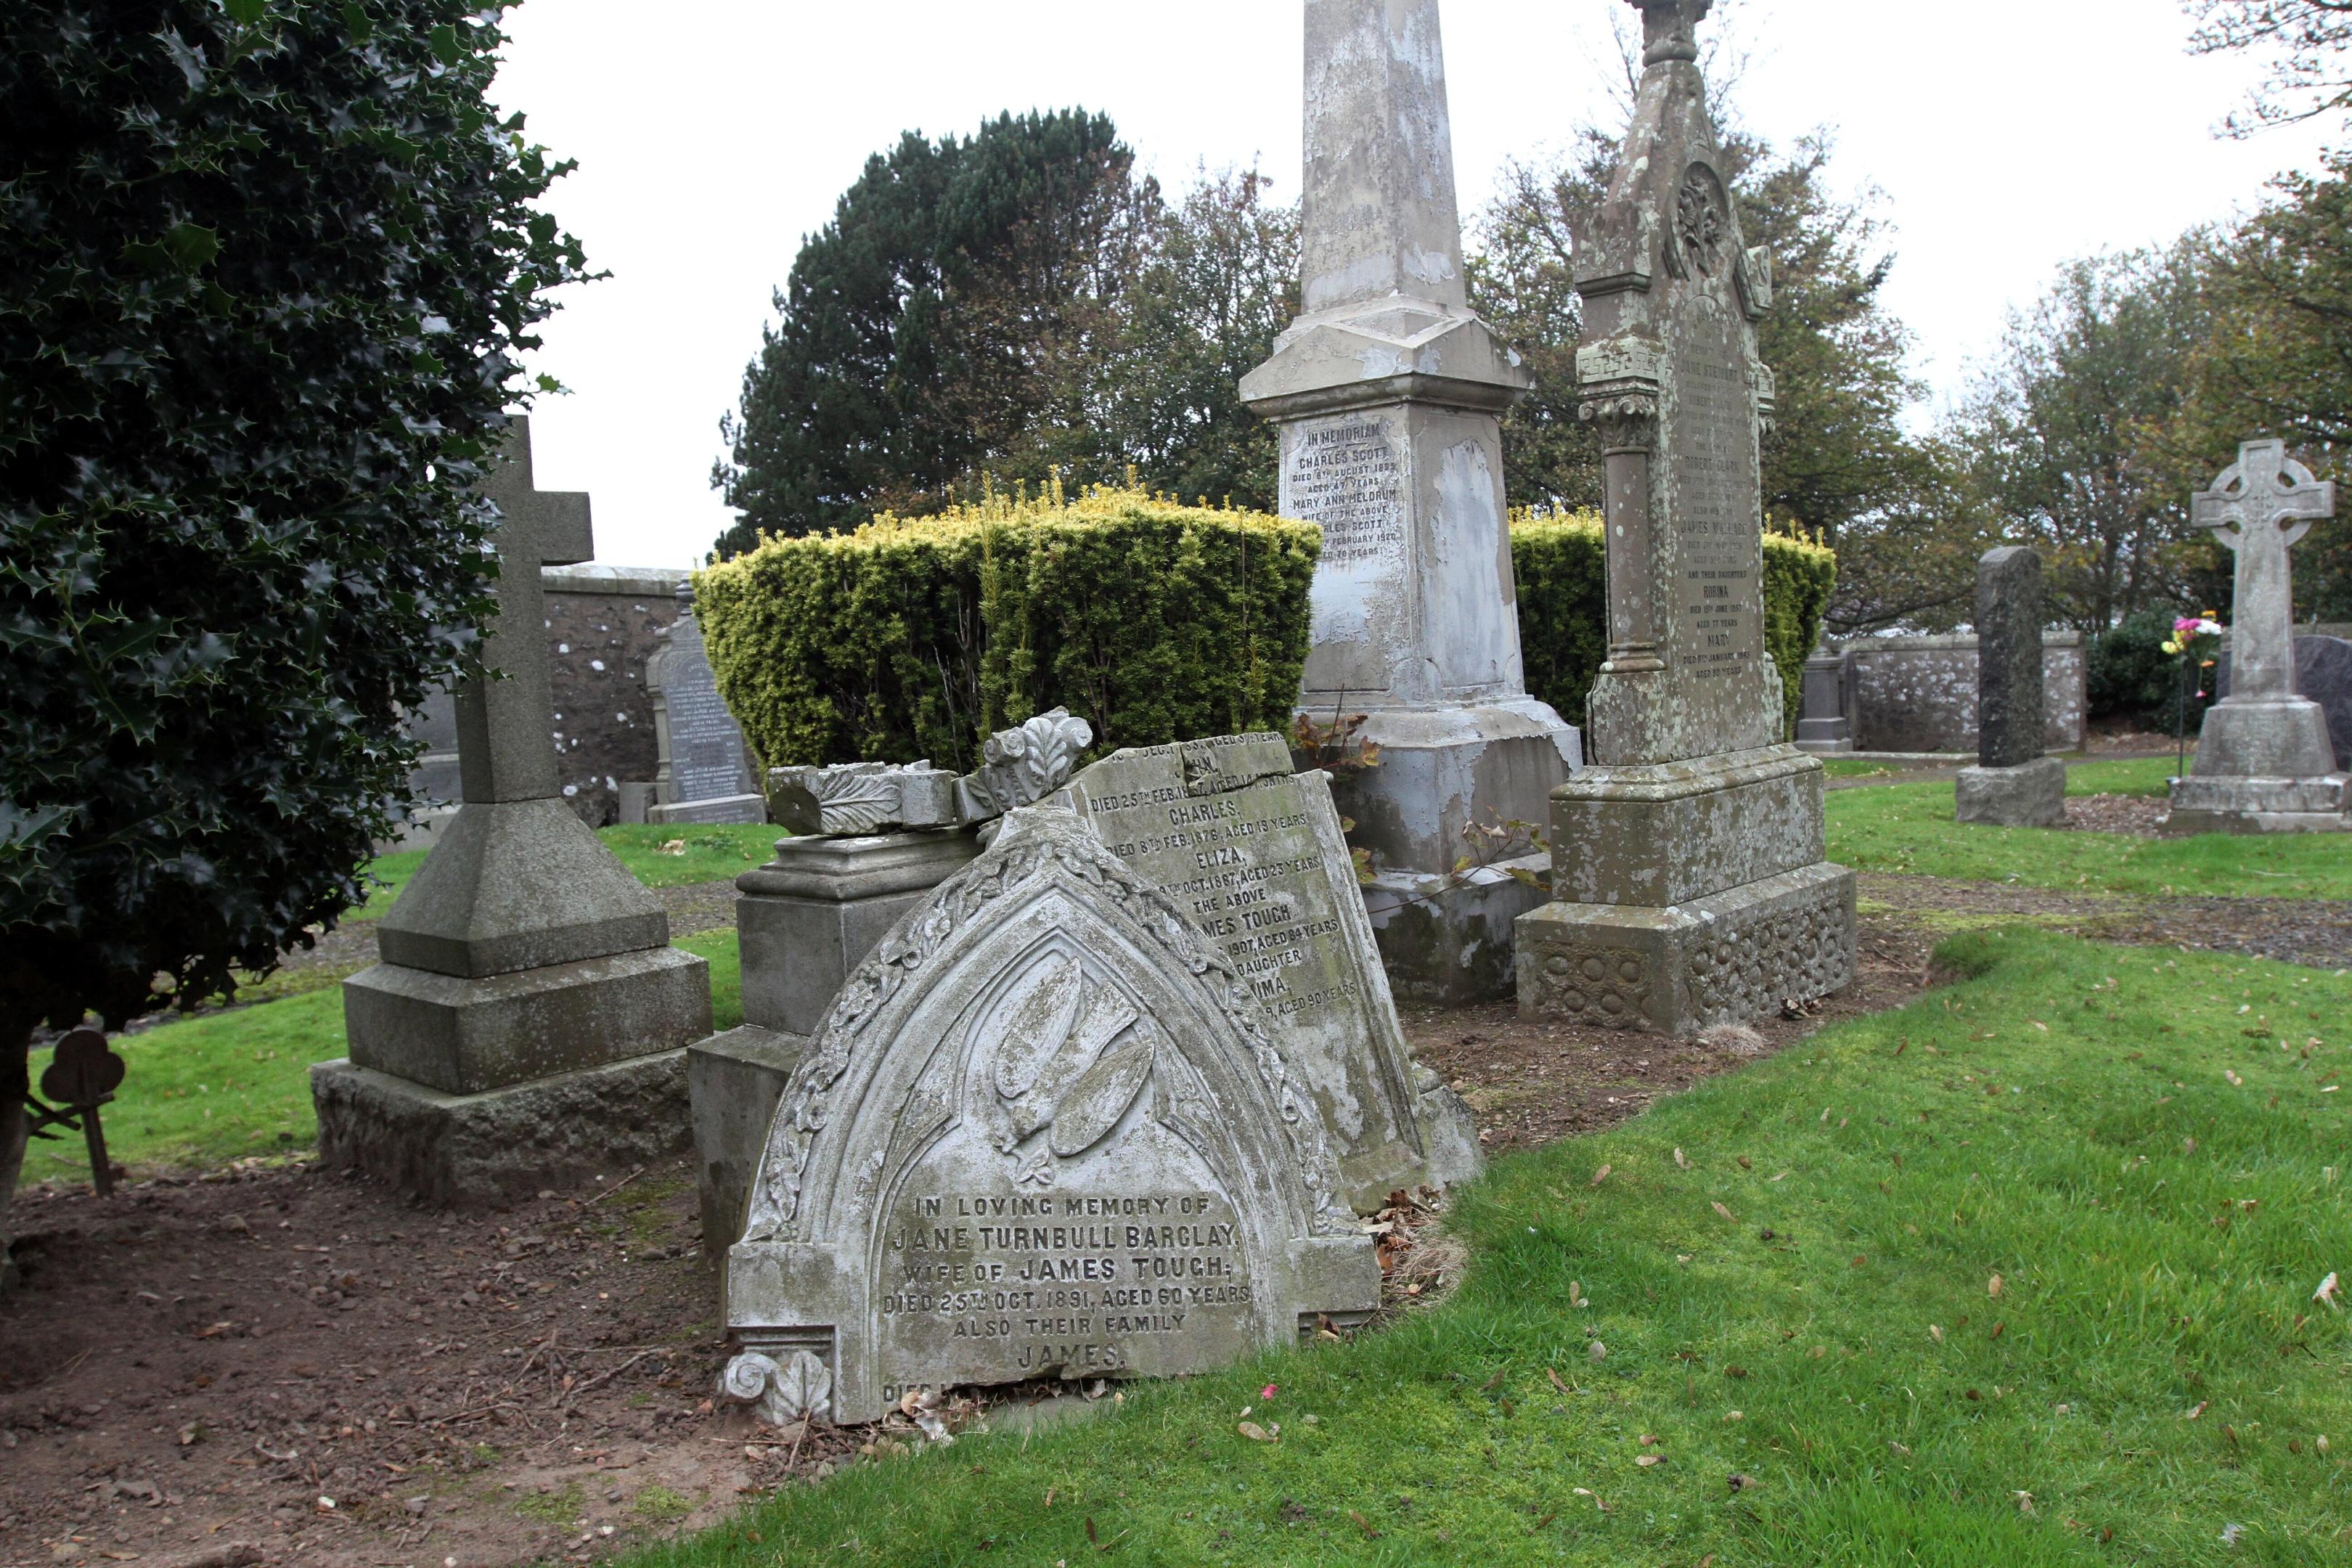 Dangerous headstones at Tayport Cemetery.